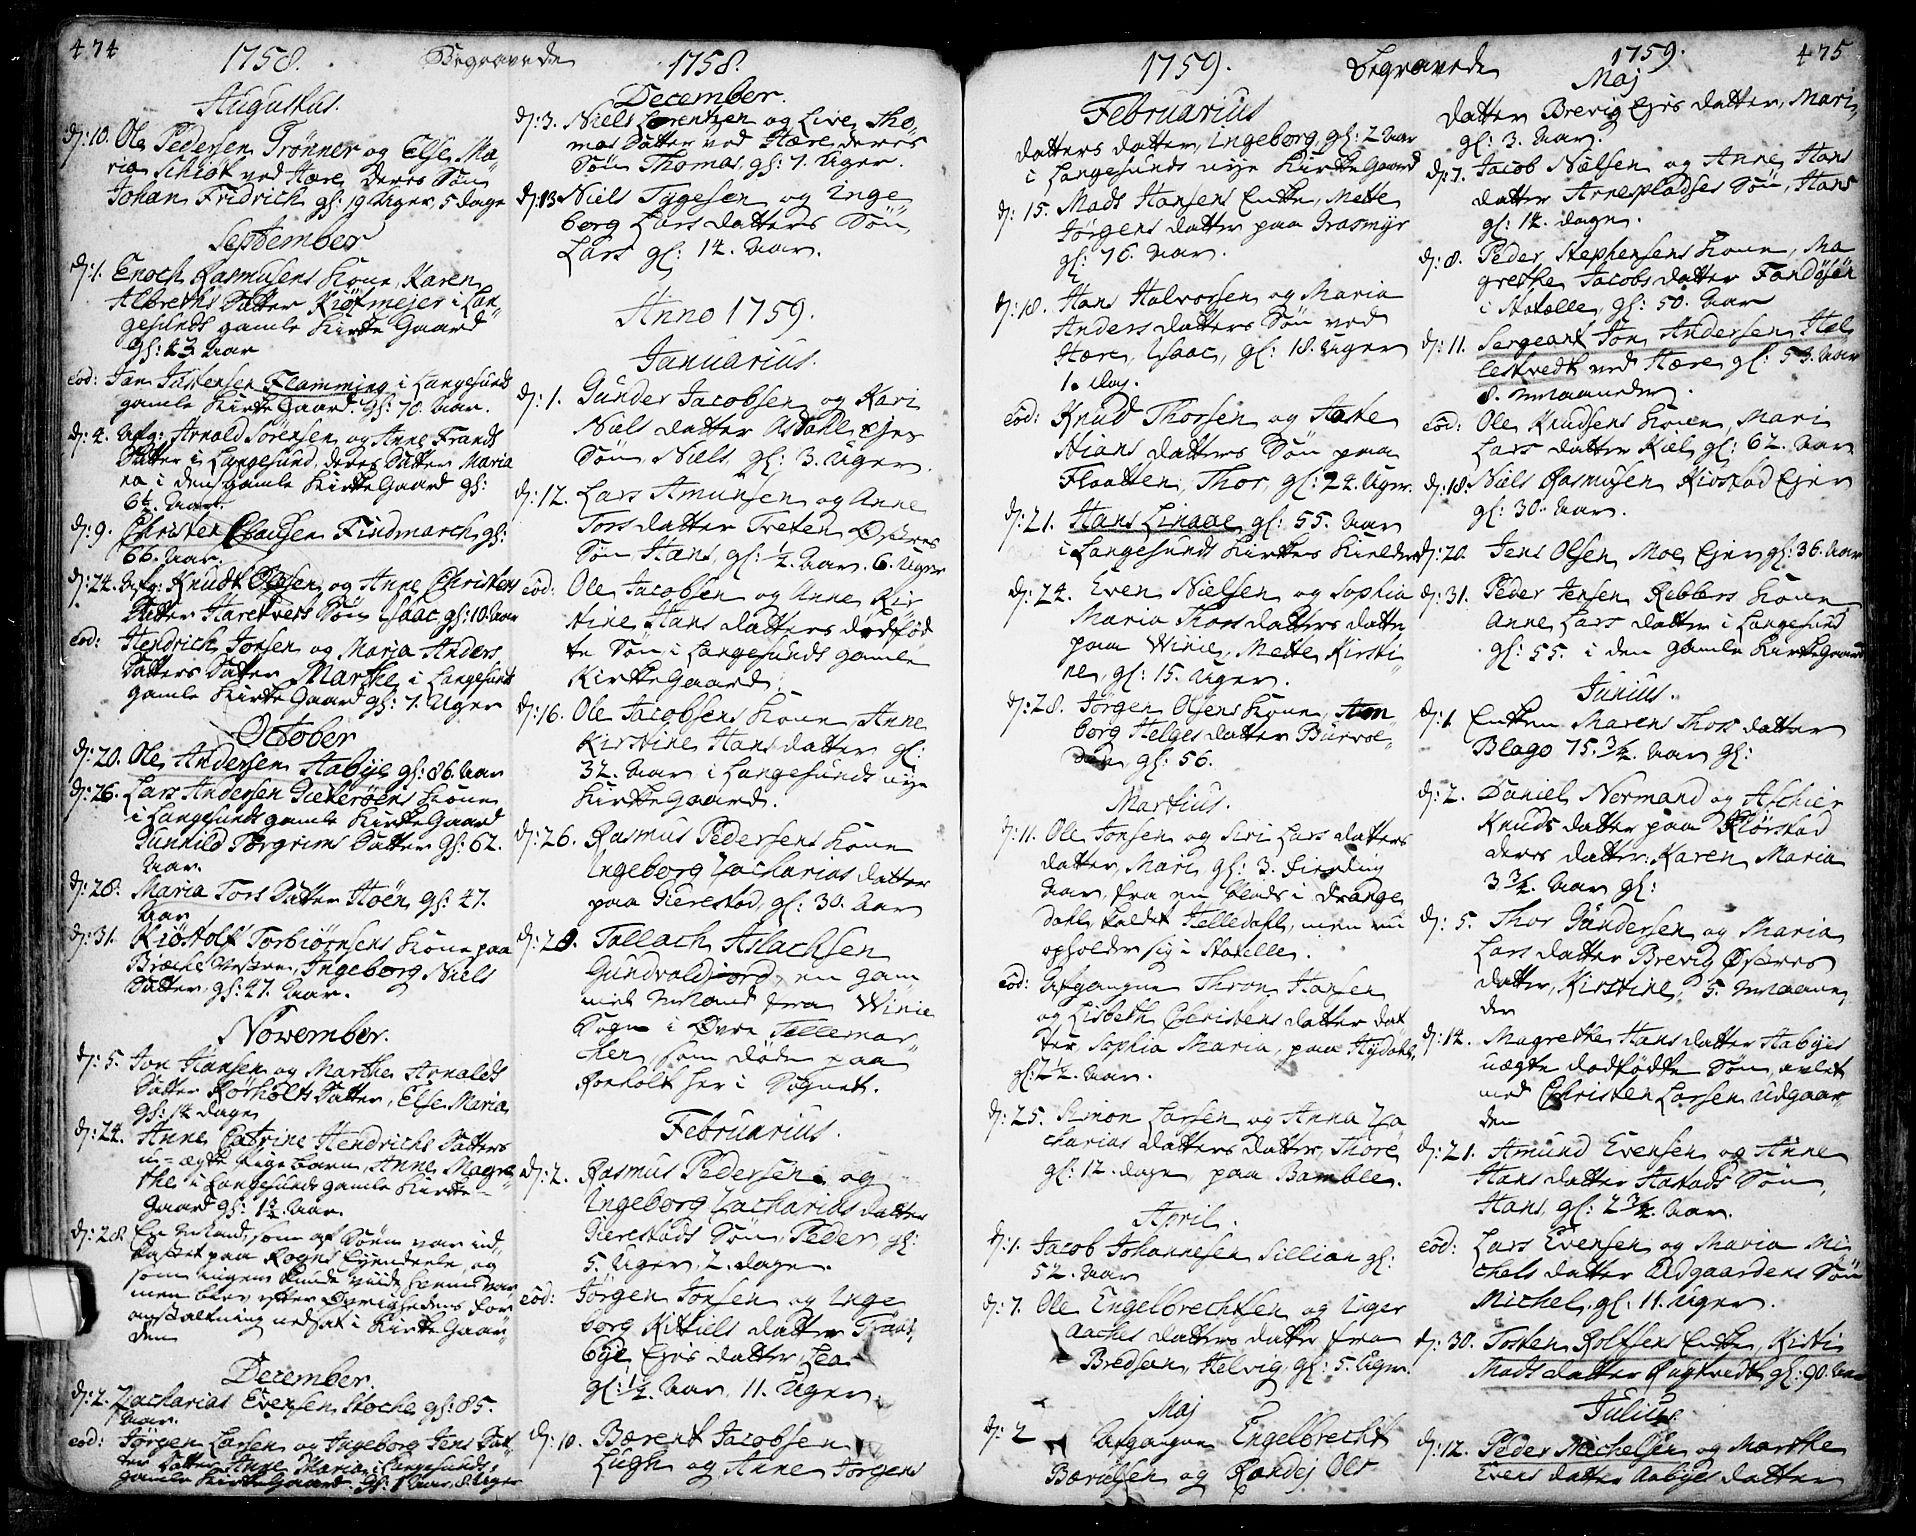 SAKO, Bamble kirkebøker, F/Fa/L0001: Ministerialbok nr. I 1, 1702-1774, s. 474-475